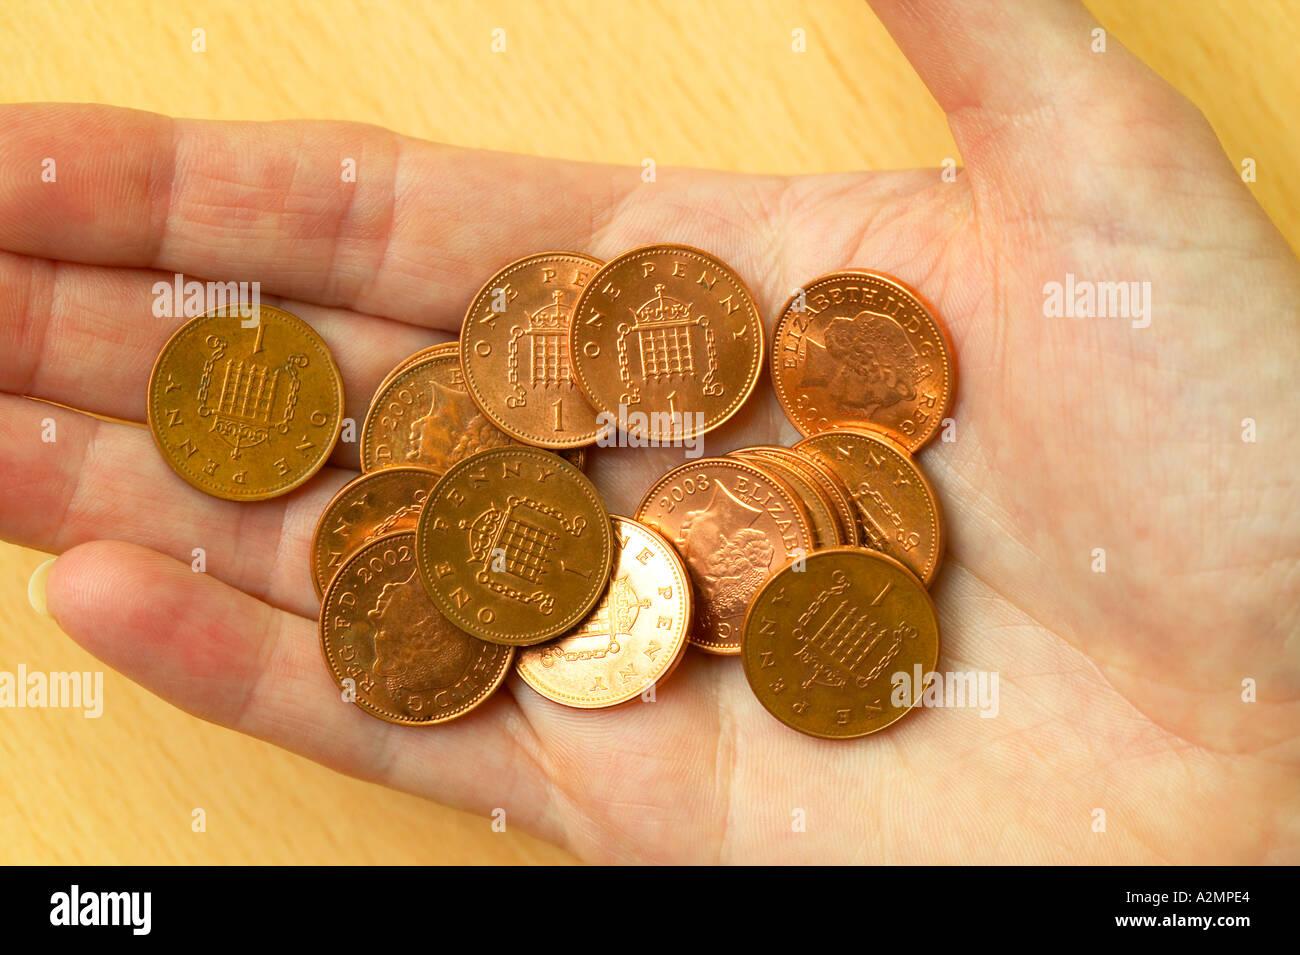 handful of pennies - Stock Image